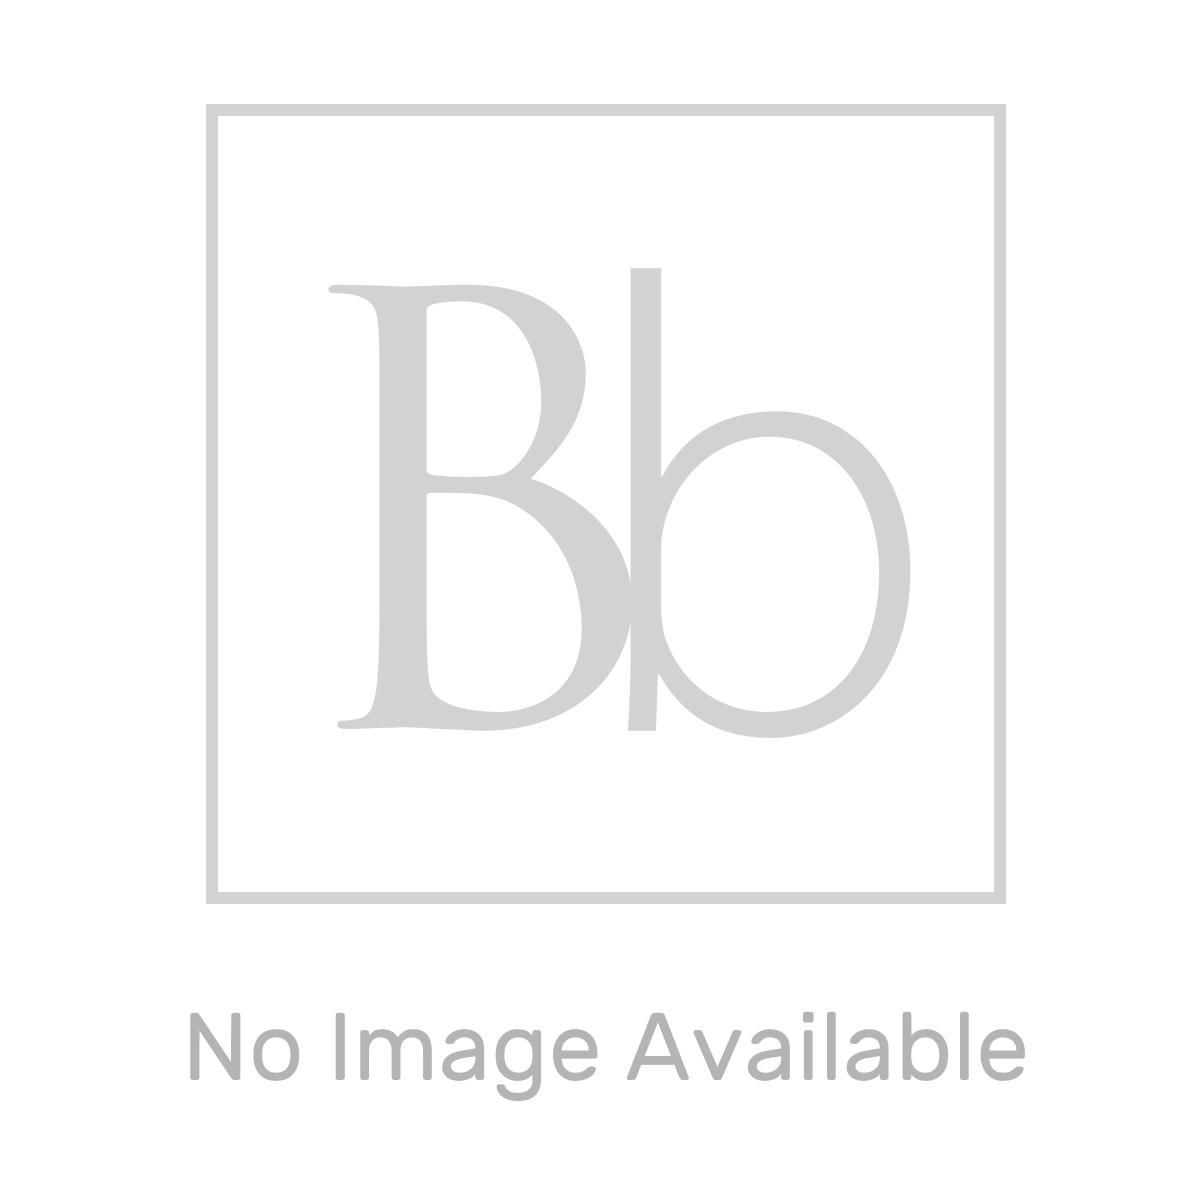 Frontline Aquaglass+ Walk In Shower Enclosure